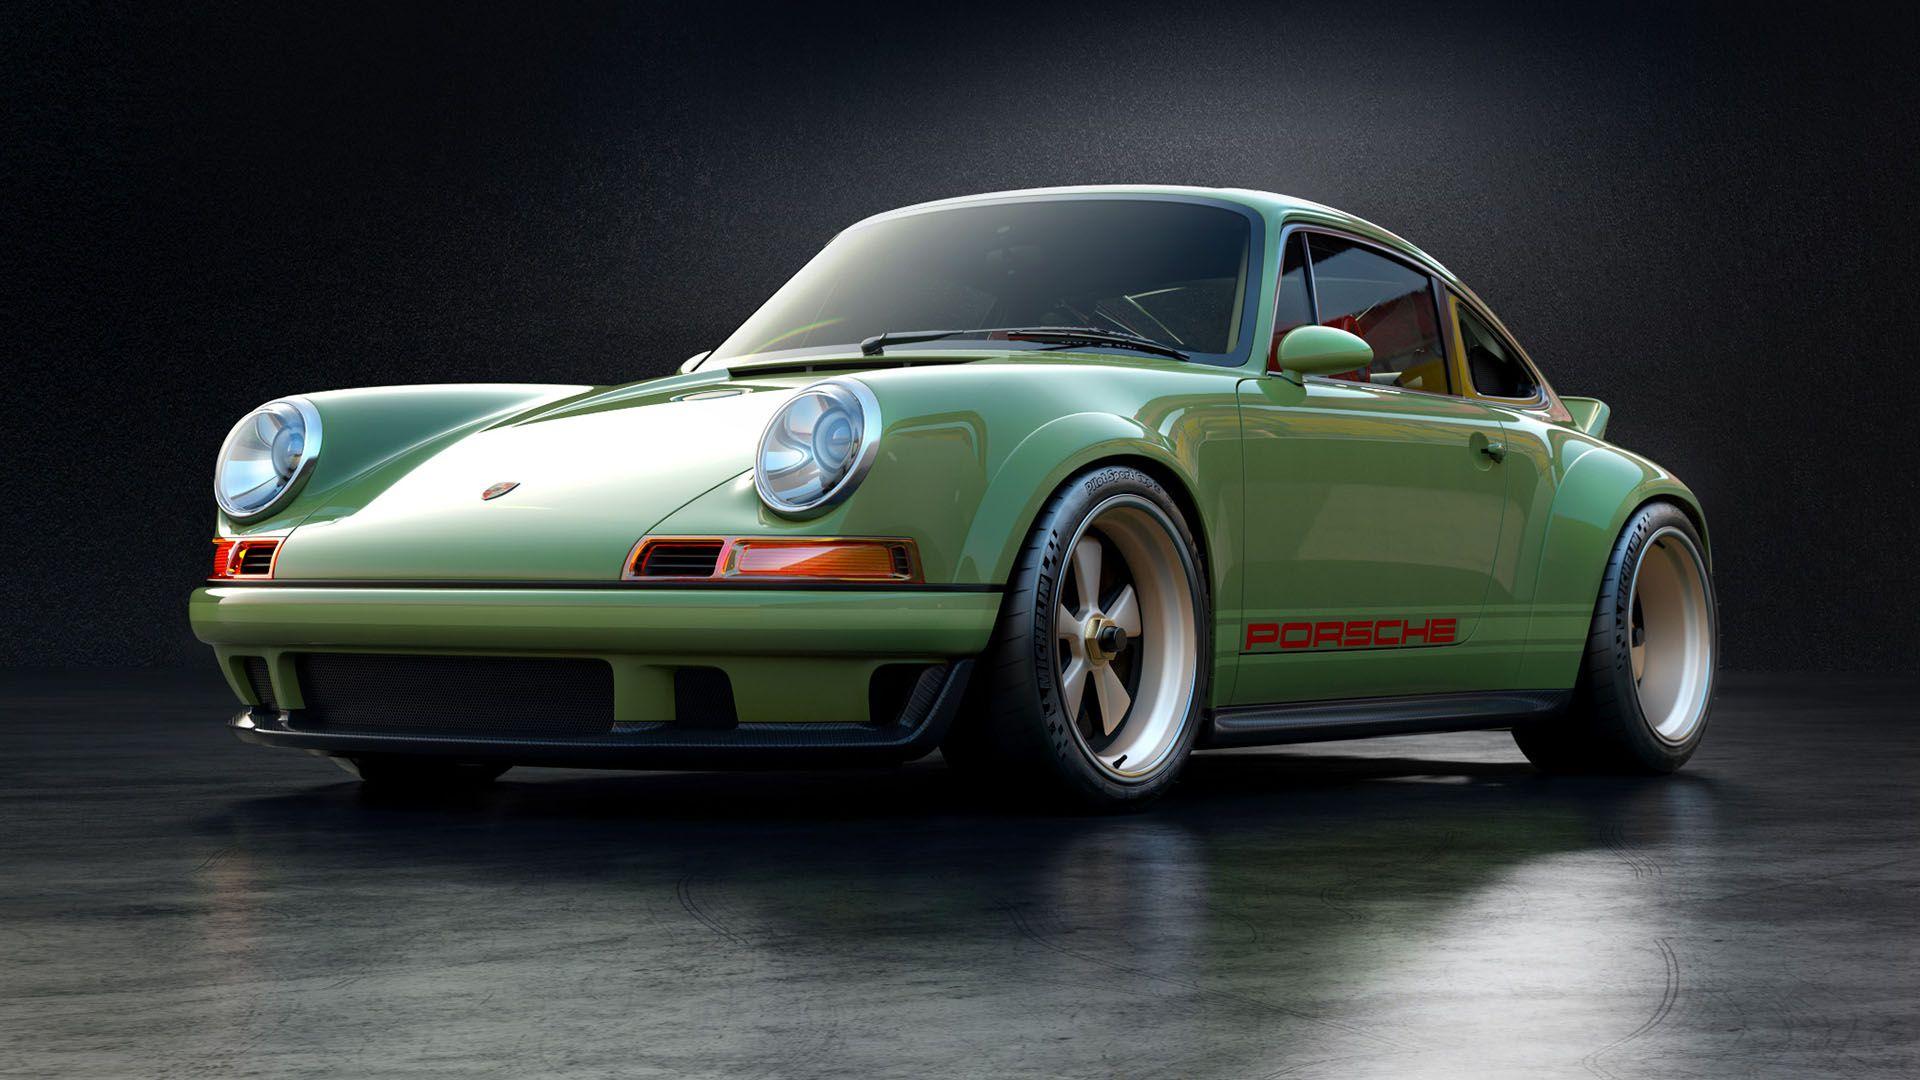 Singer Dls B 2048px Online Jpg 1920 1080 Porsche 964 Porsche Classico Carros Porsche